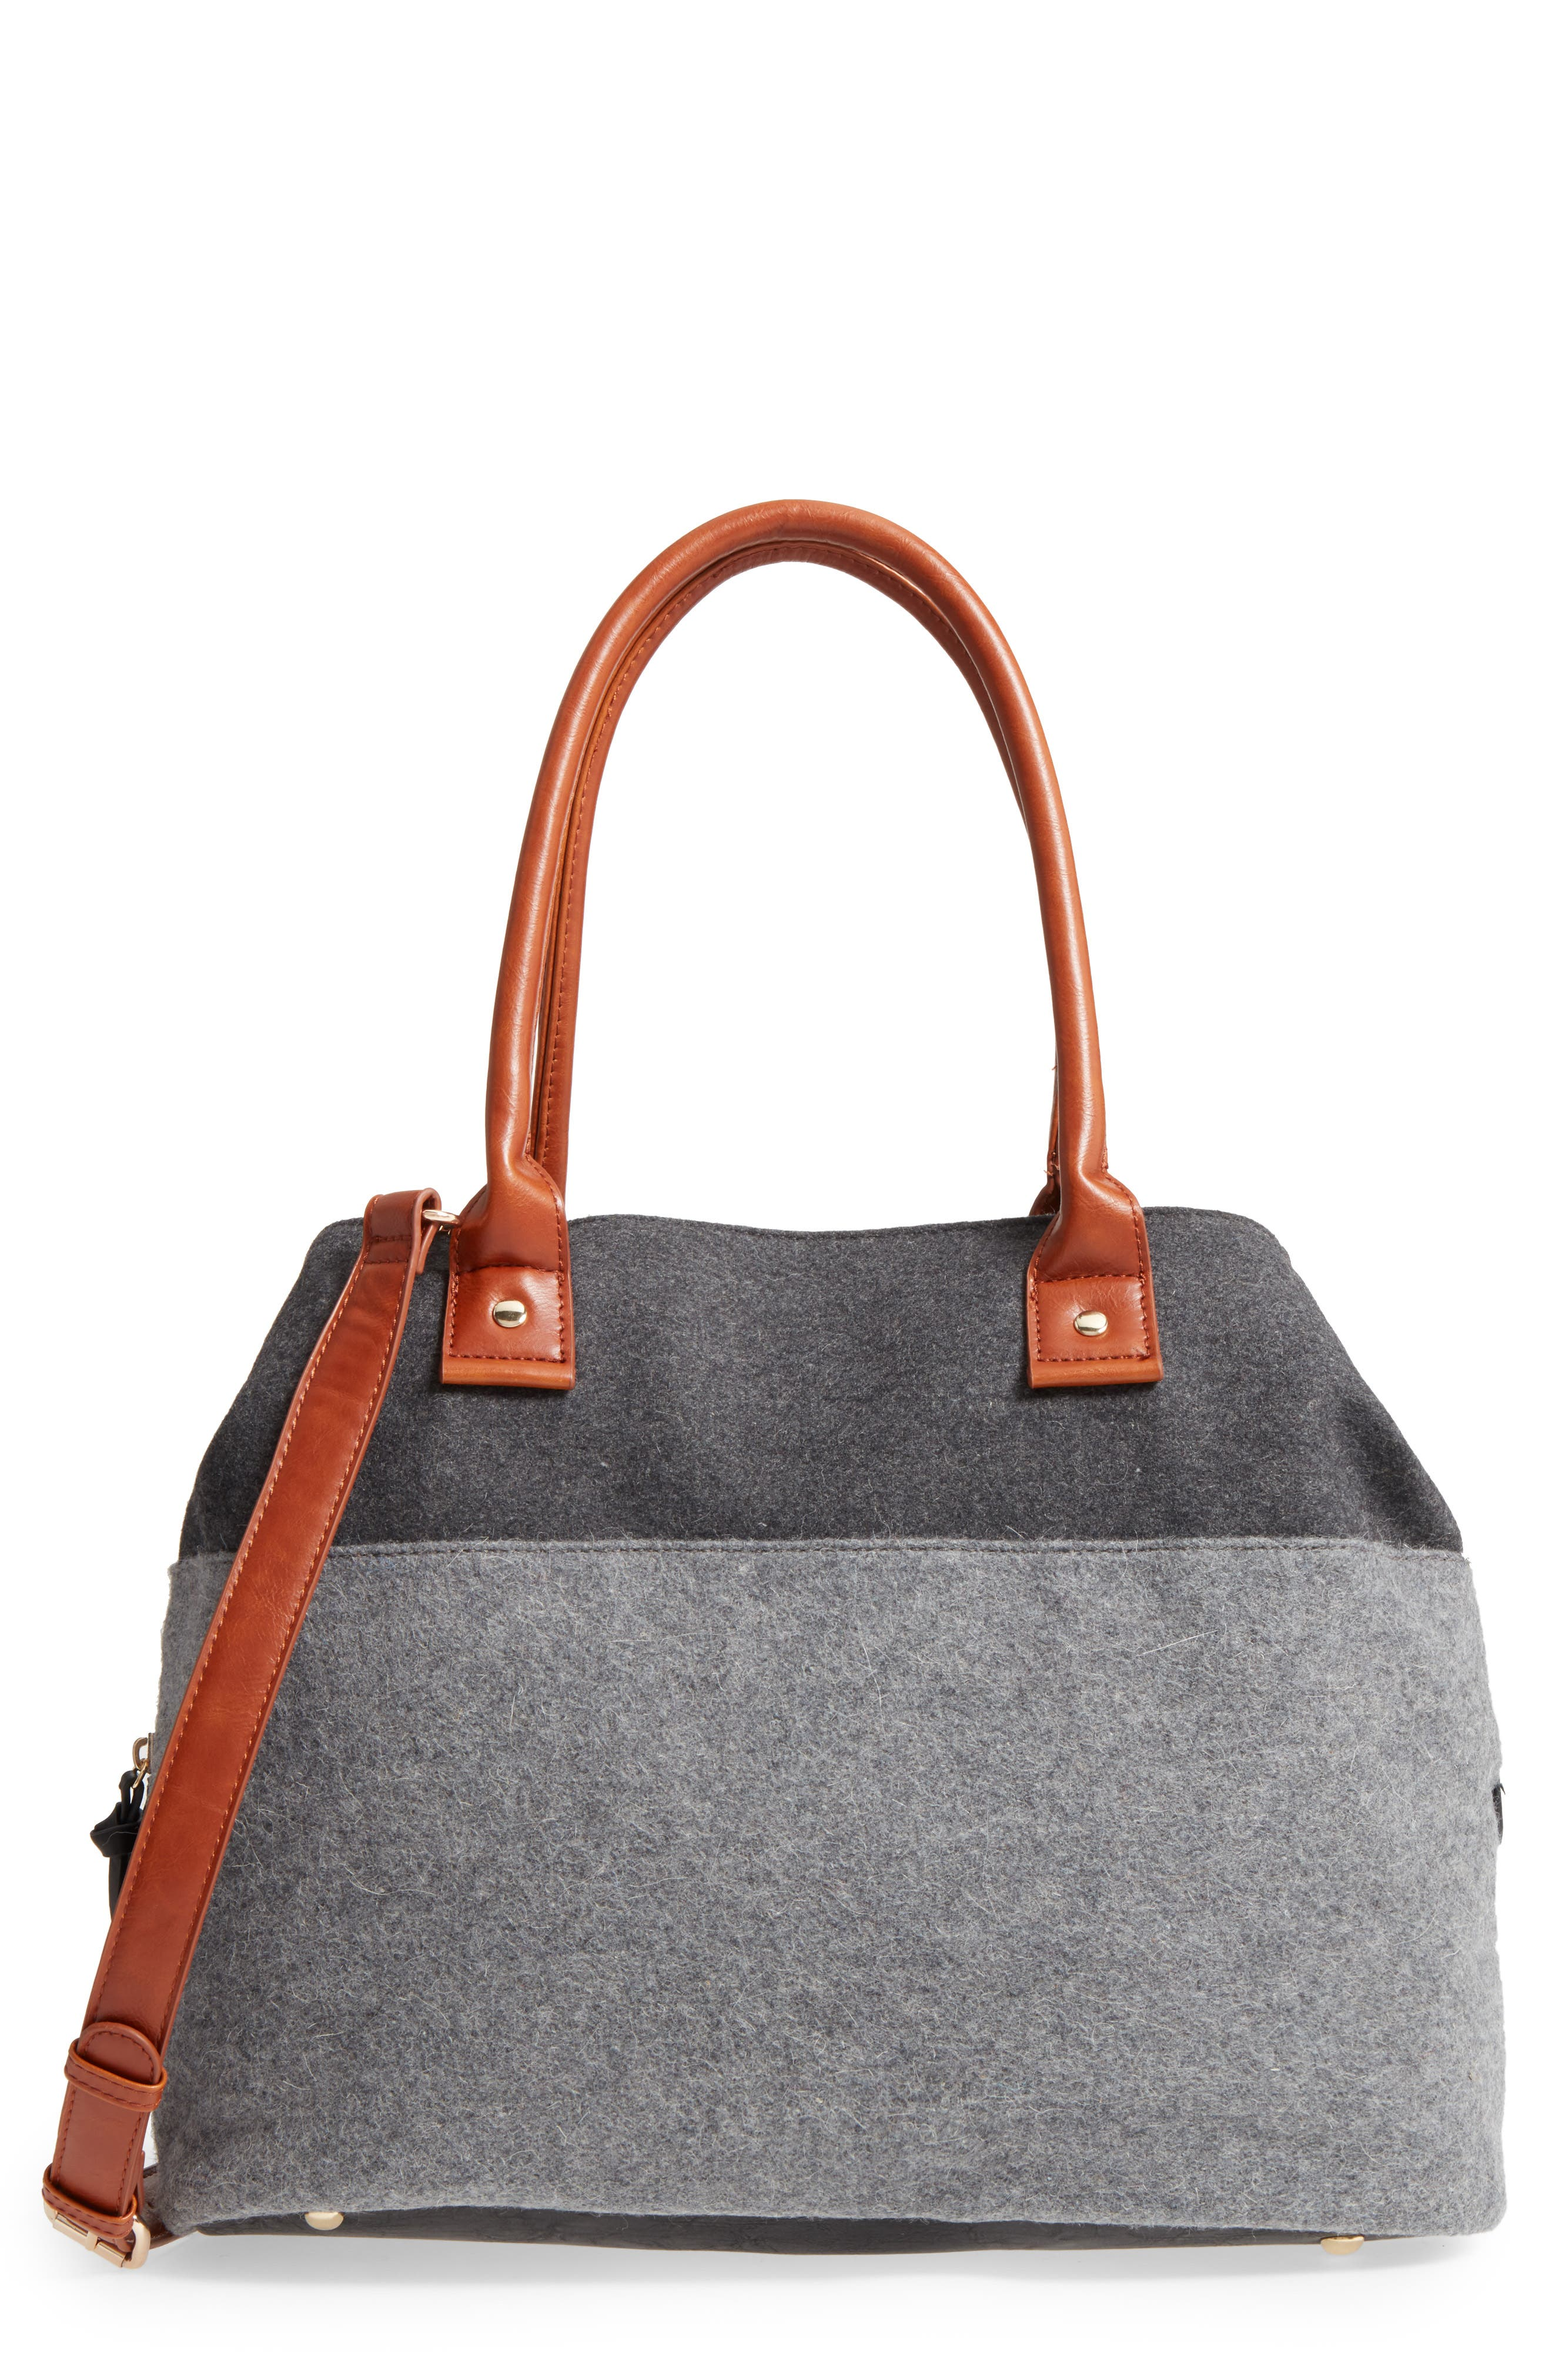 Main Image - Sole Society Chasity Duffel Bag